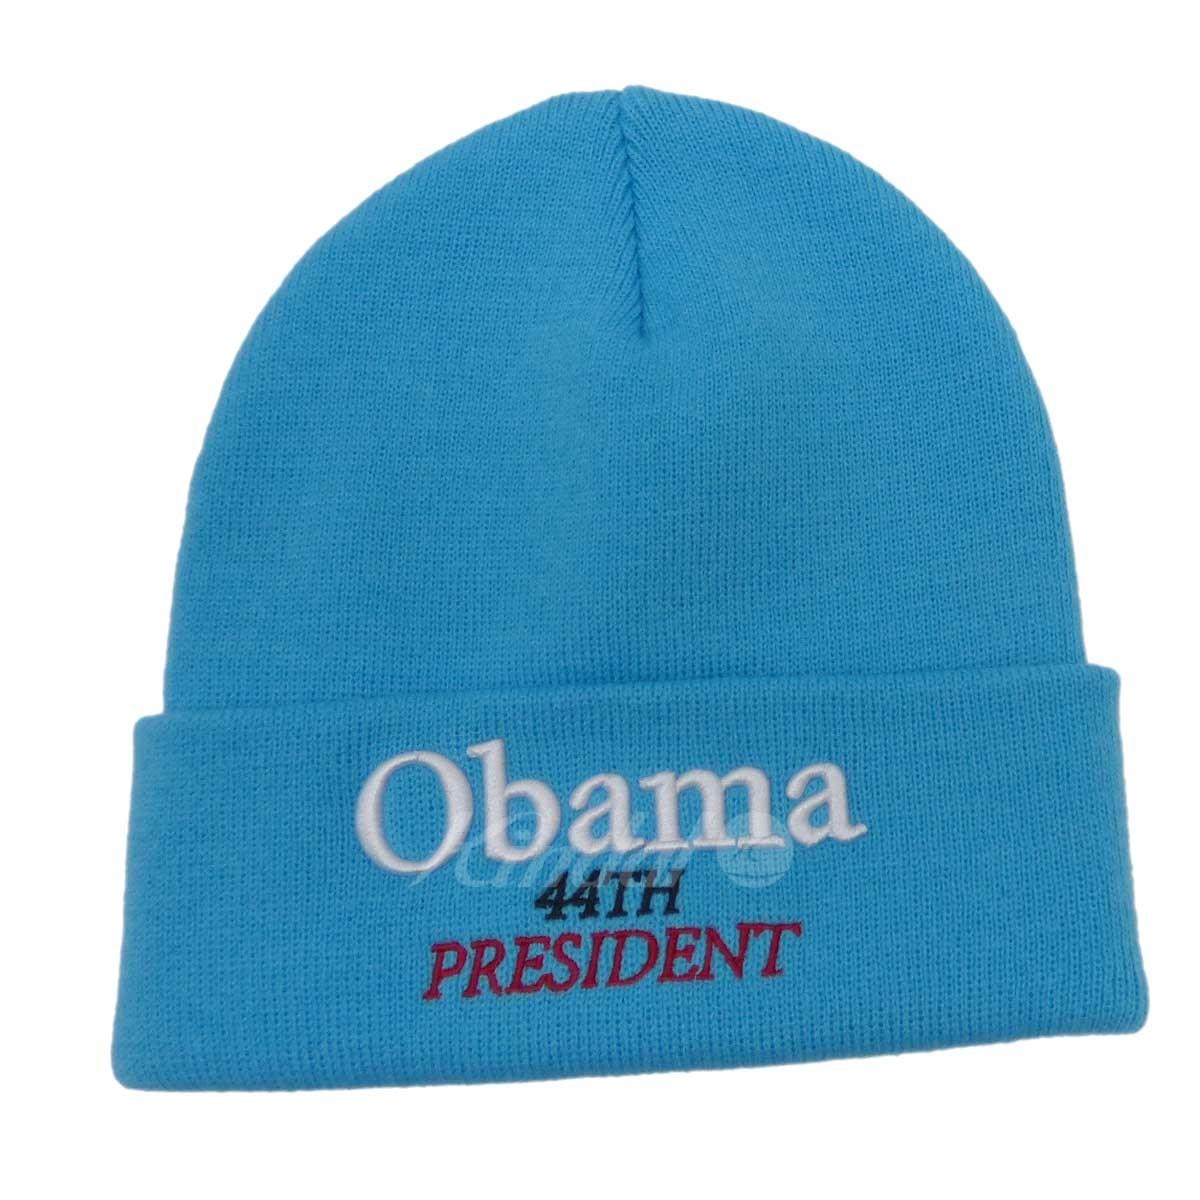 5c43734873 kindal  SUPREME Obama Beanie knit cap blue (シュプリーム)